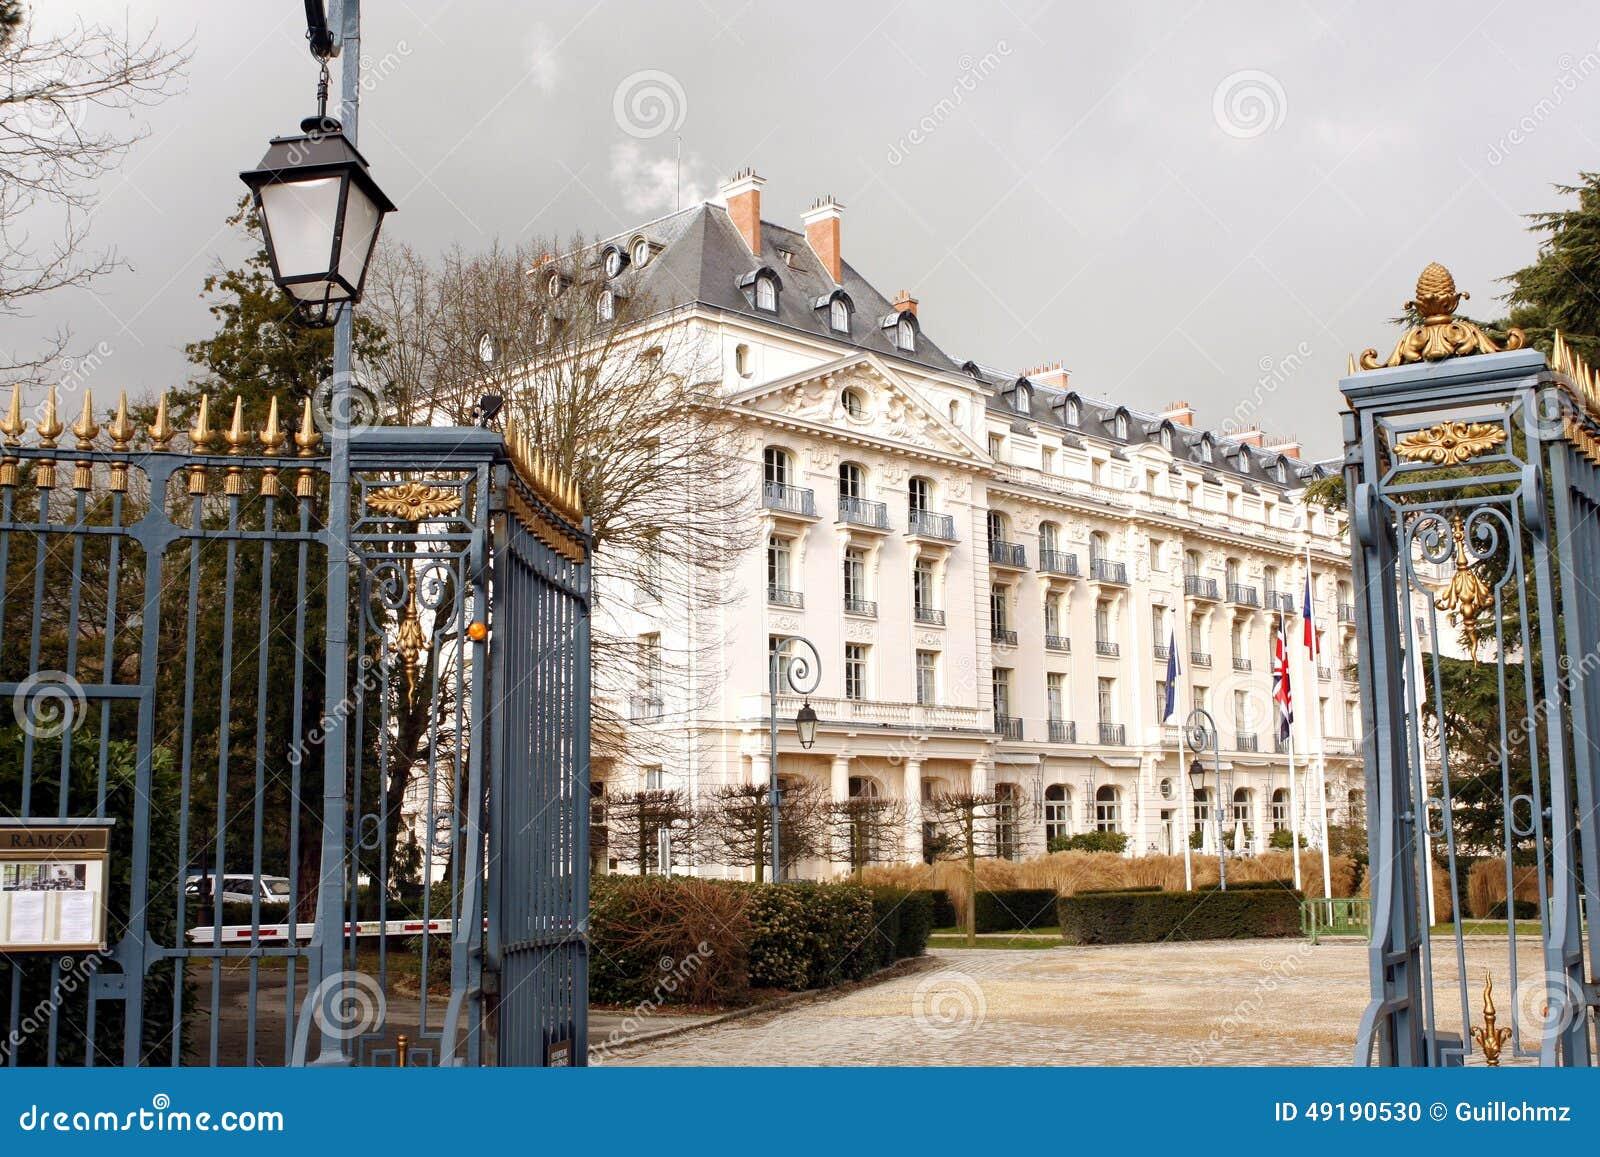 Waldorf astoria trianon palace hotel versailles editorial image image of hotel waldorf - Hotel trianon versailles ...